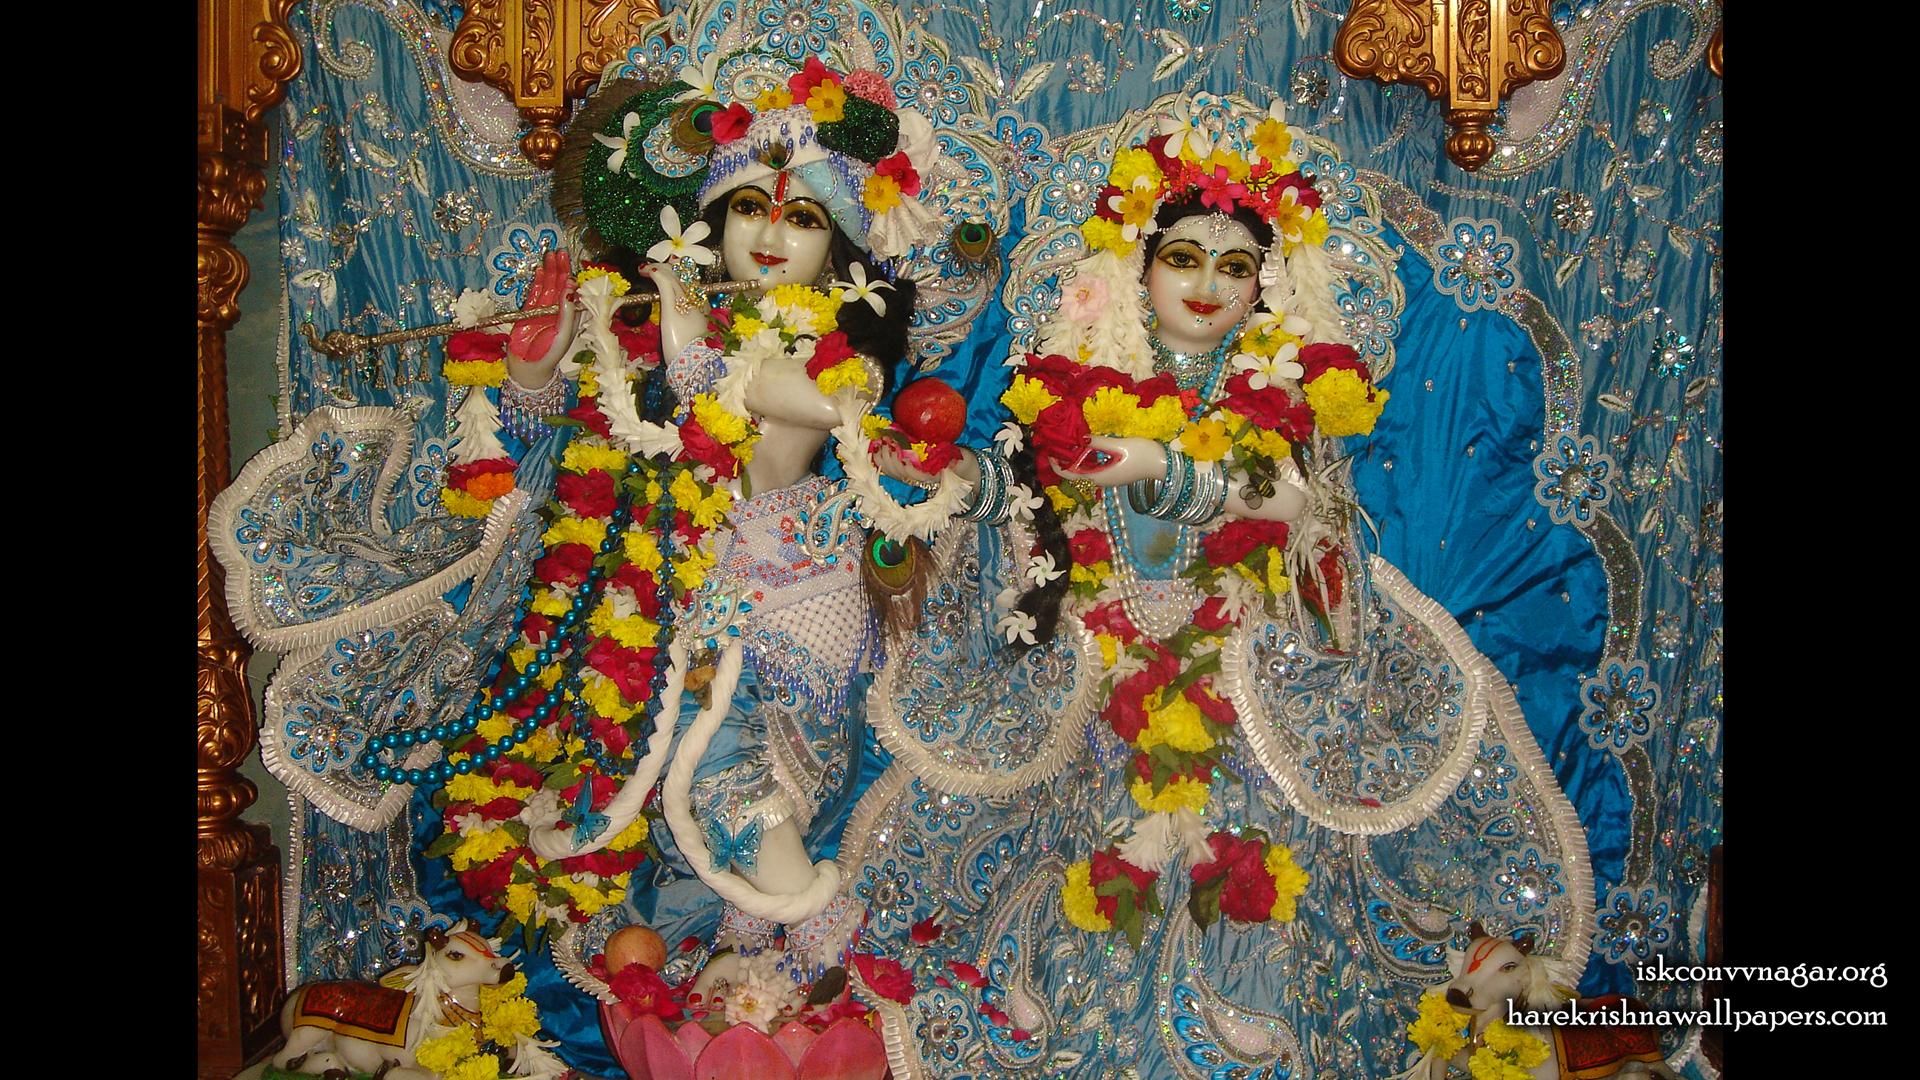 Sri Sri Radha Giridhari Wallpaper (032) Size 1920x1080 Download